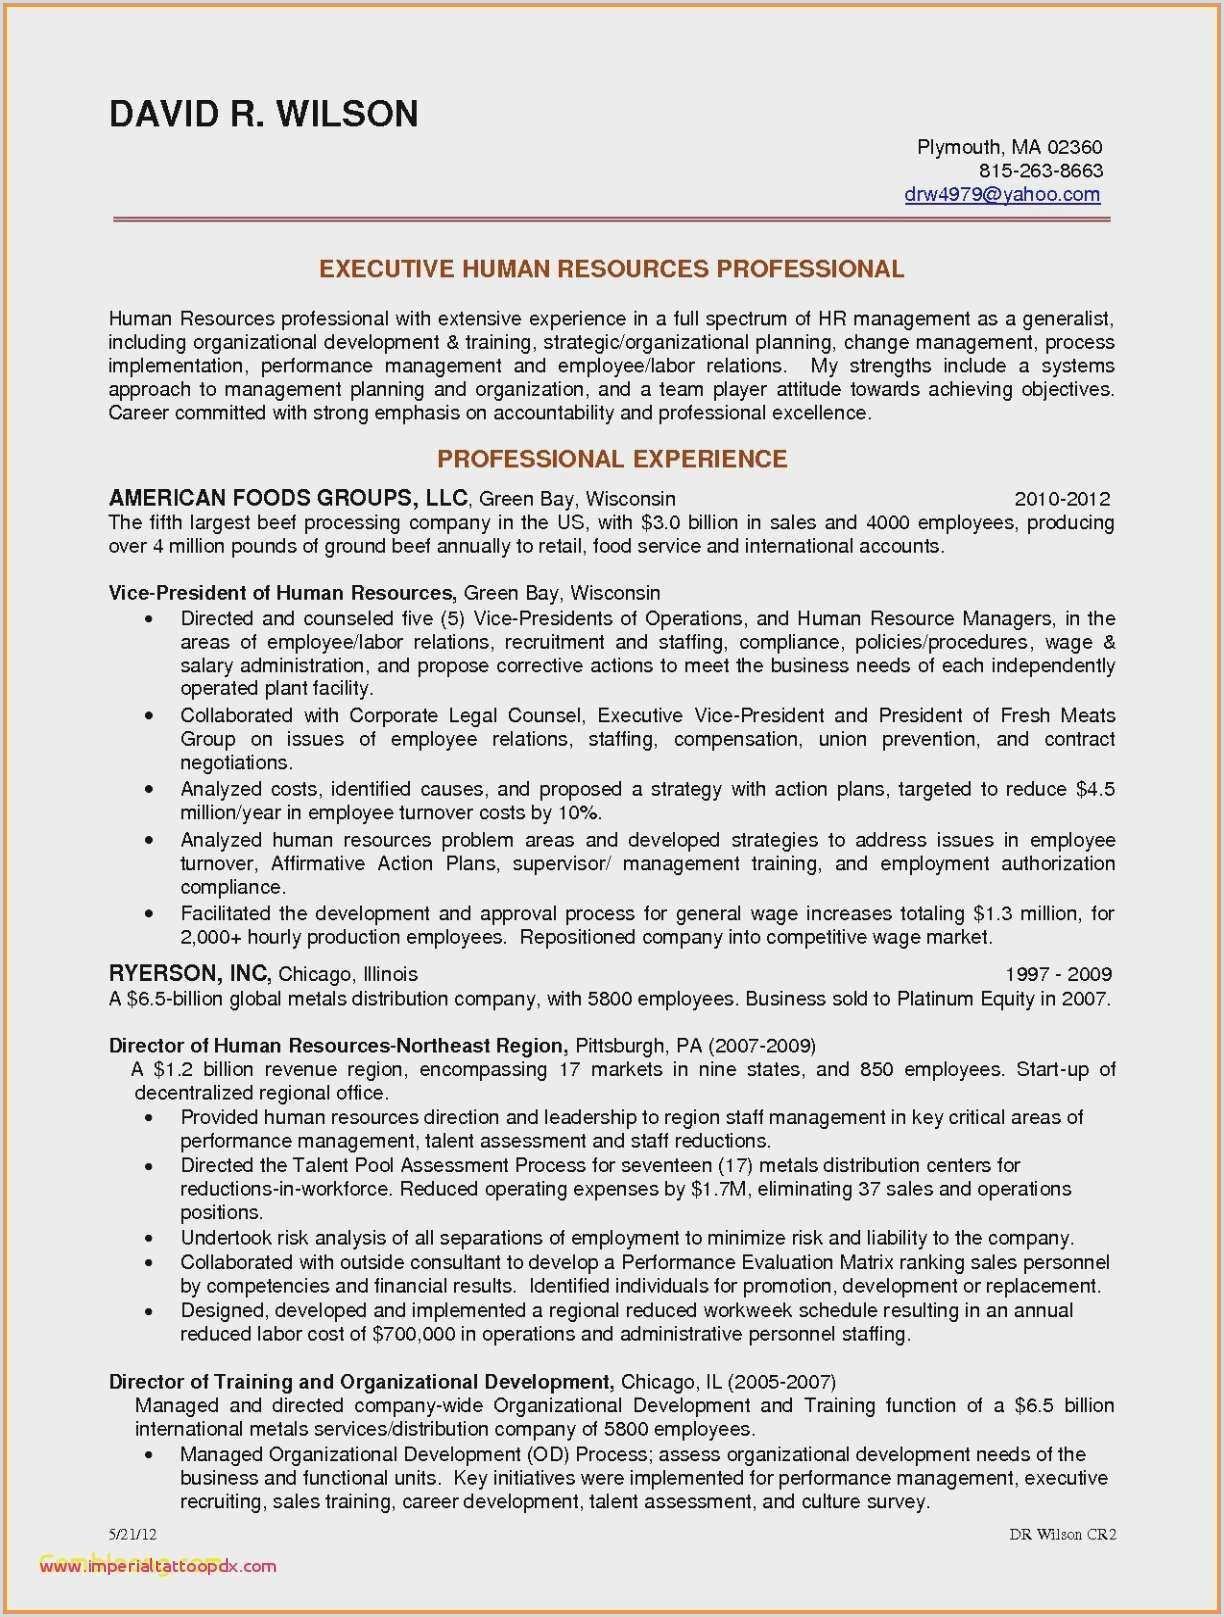 Cv Professional Experience Examples Cv original Design Libre 14 Graphic Design Resume Personal